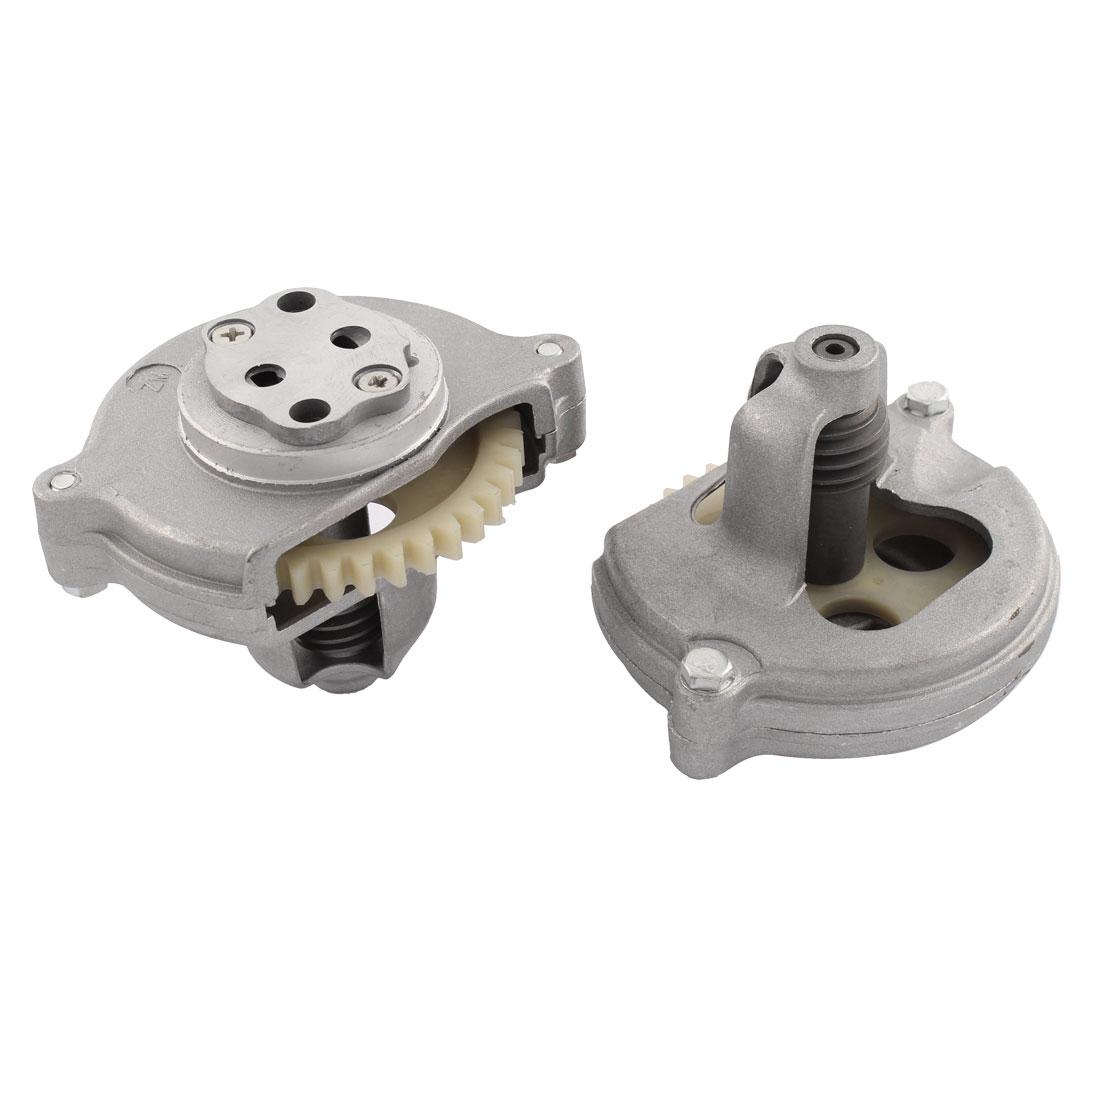 Pair Sliver Tone Plastic Metal Engine Motor Oil Fuel Pump for CG125 Motorcycle